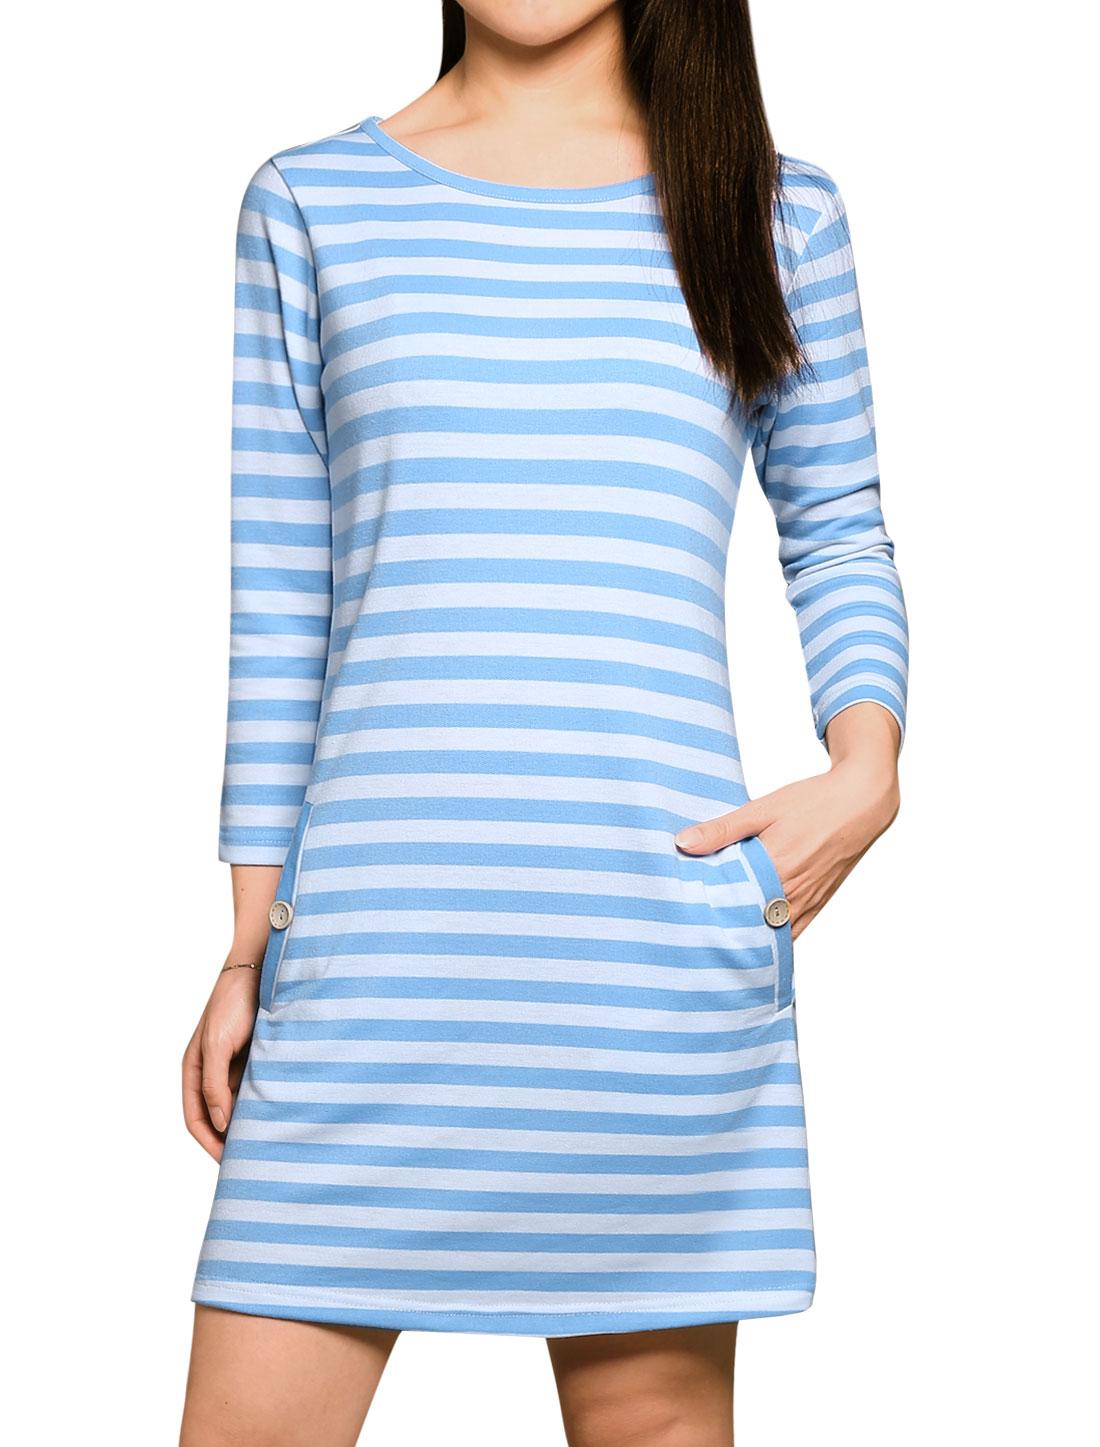 Woman Stripes 3/4 Sleeves Scoop Neck Slant Pockets Mini Dress Blue XS